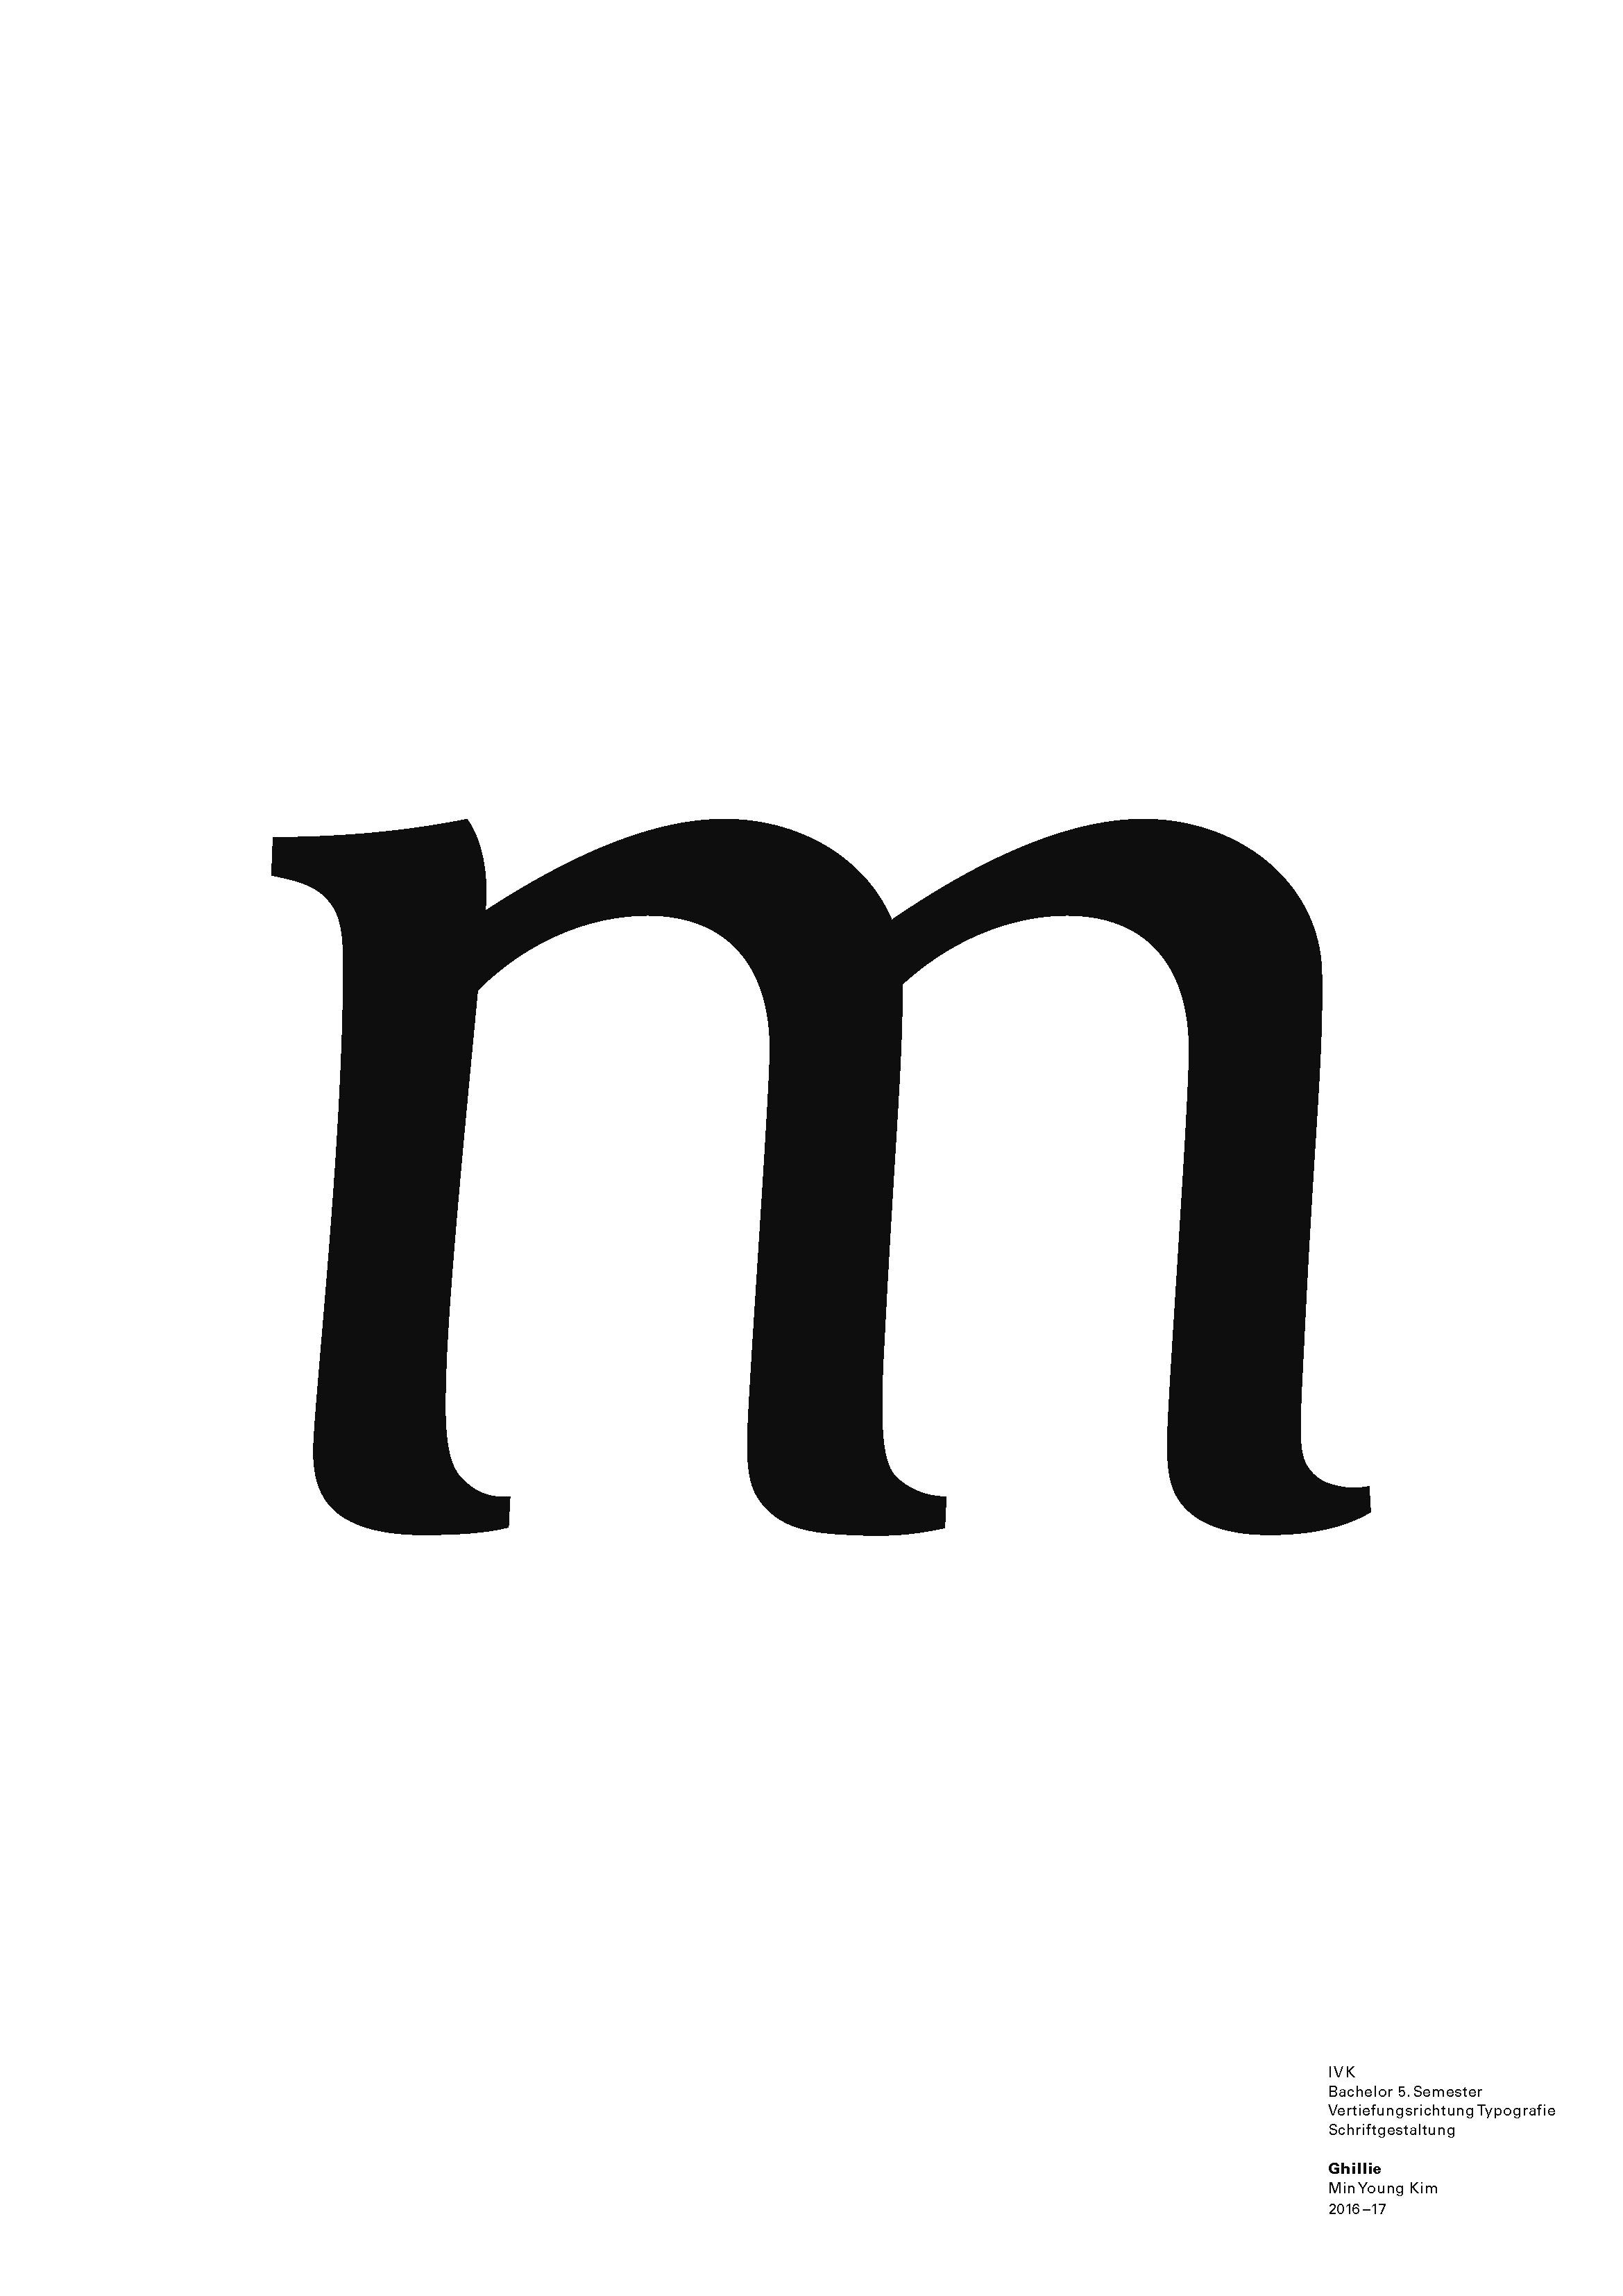 5_buchstaben_페이지_4.jpg